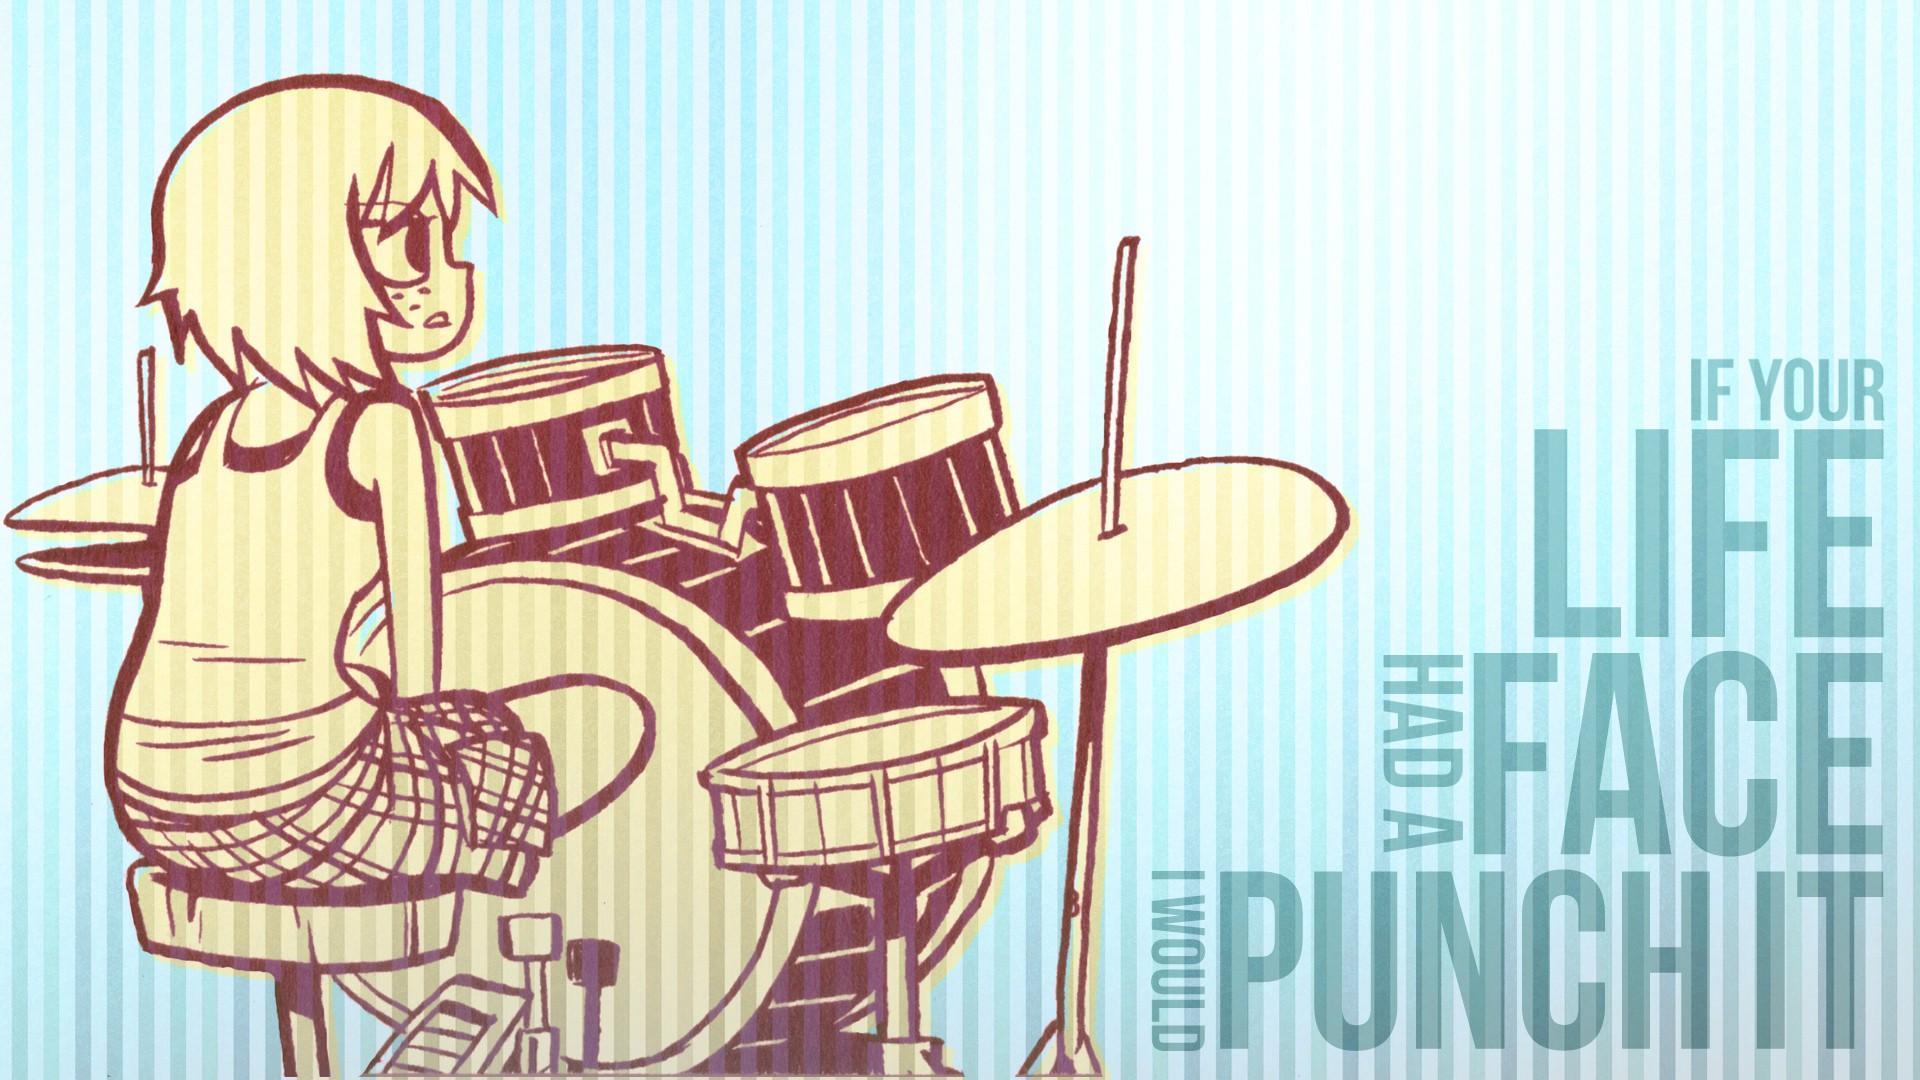 Wallpaper 1920x1080 Px Anime Girls Drums Quote Scott Pilgrim